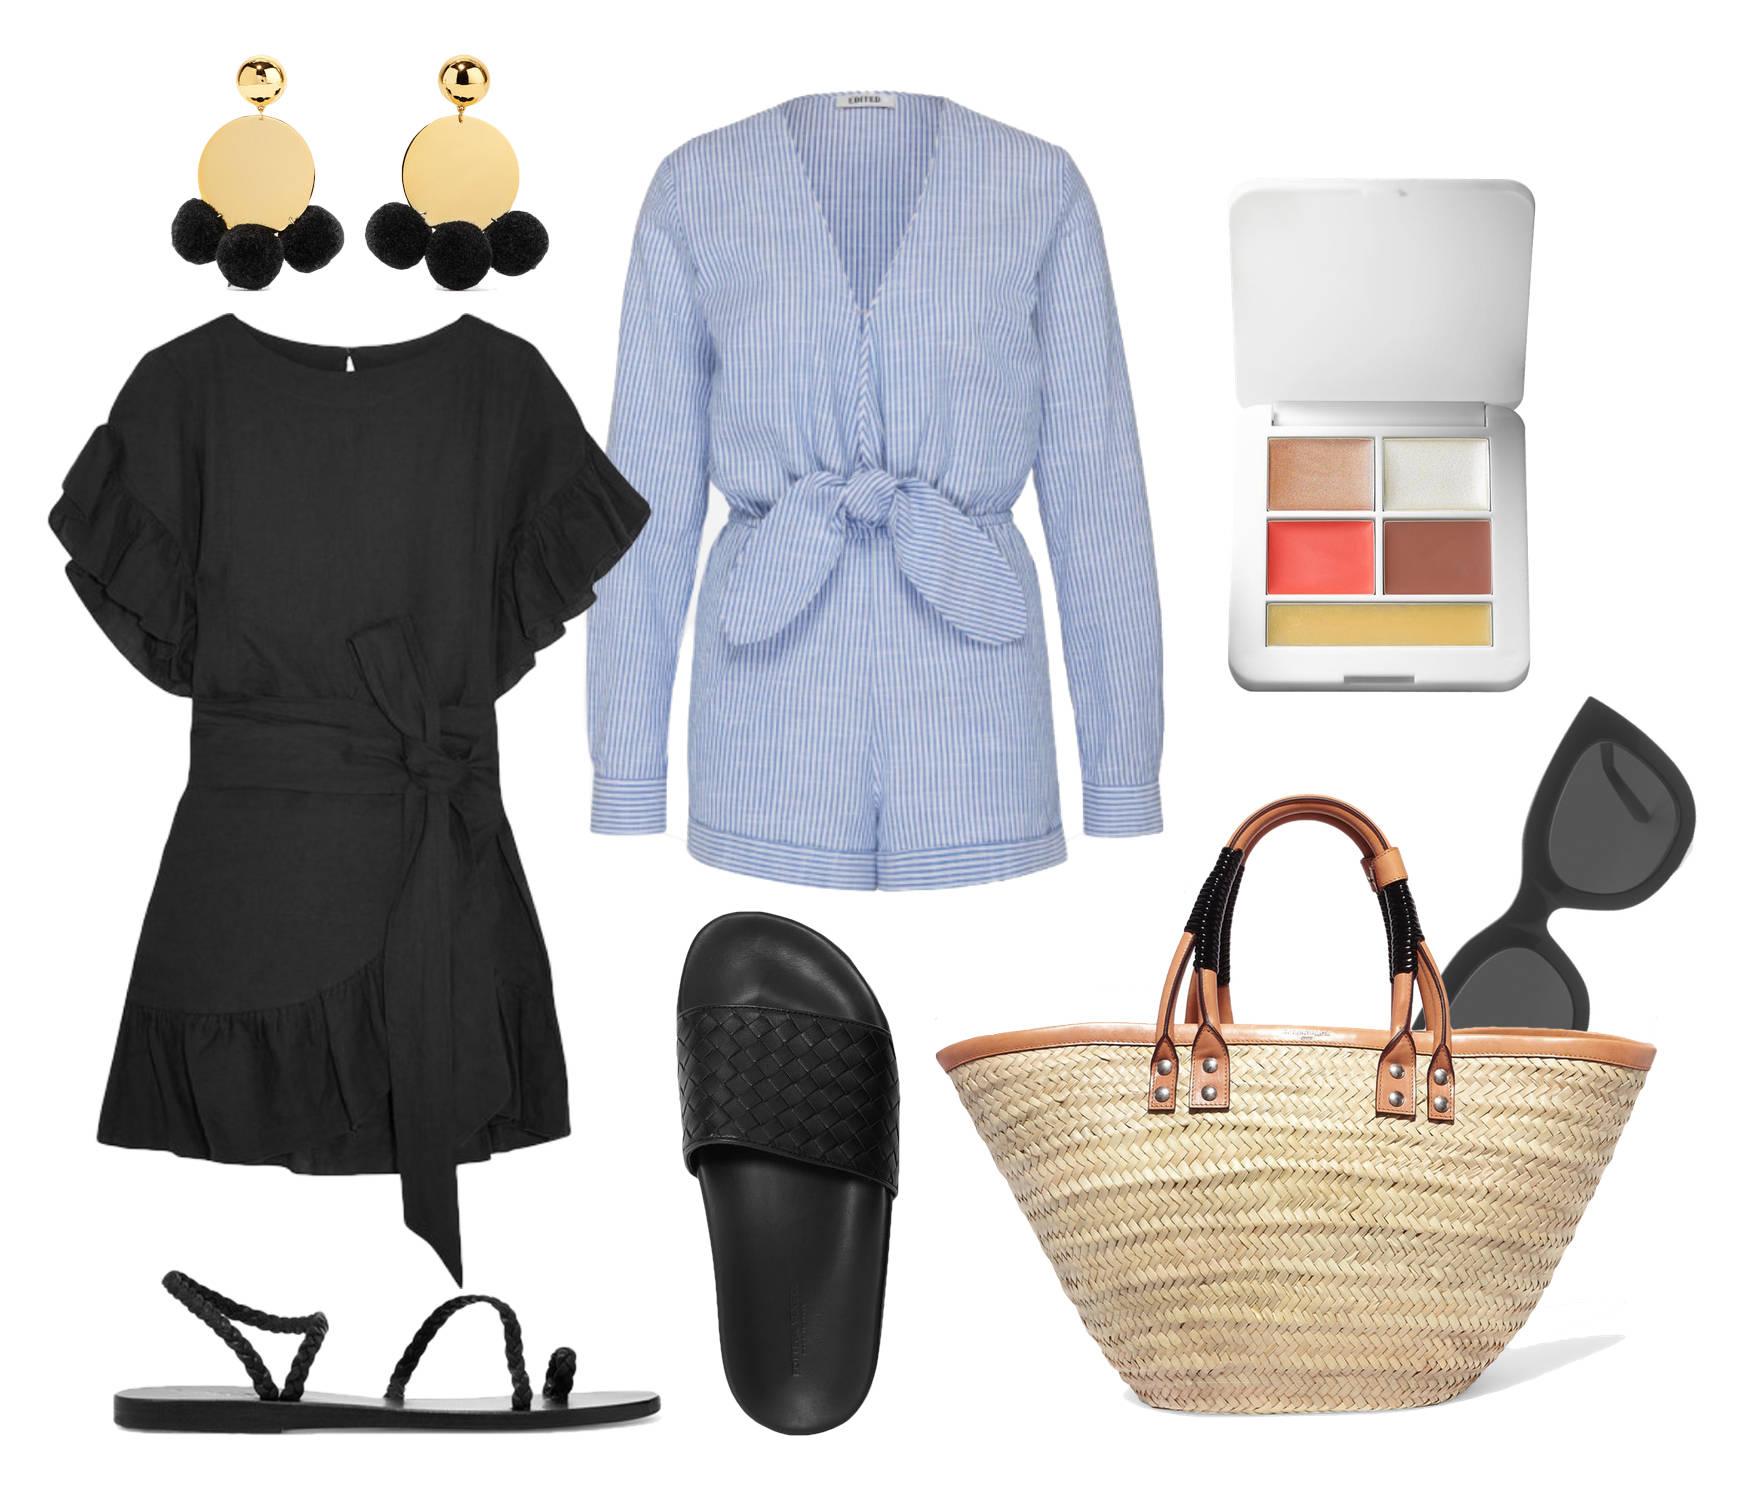 la_attire_onmymind